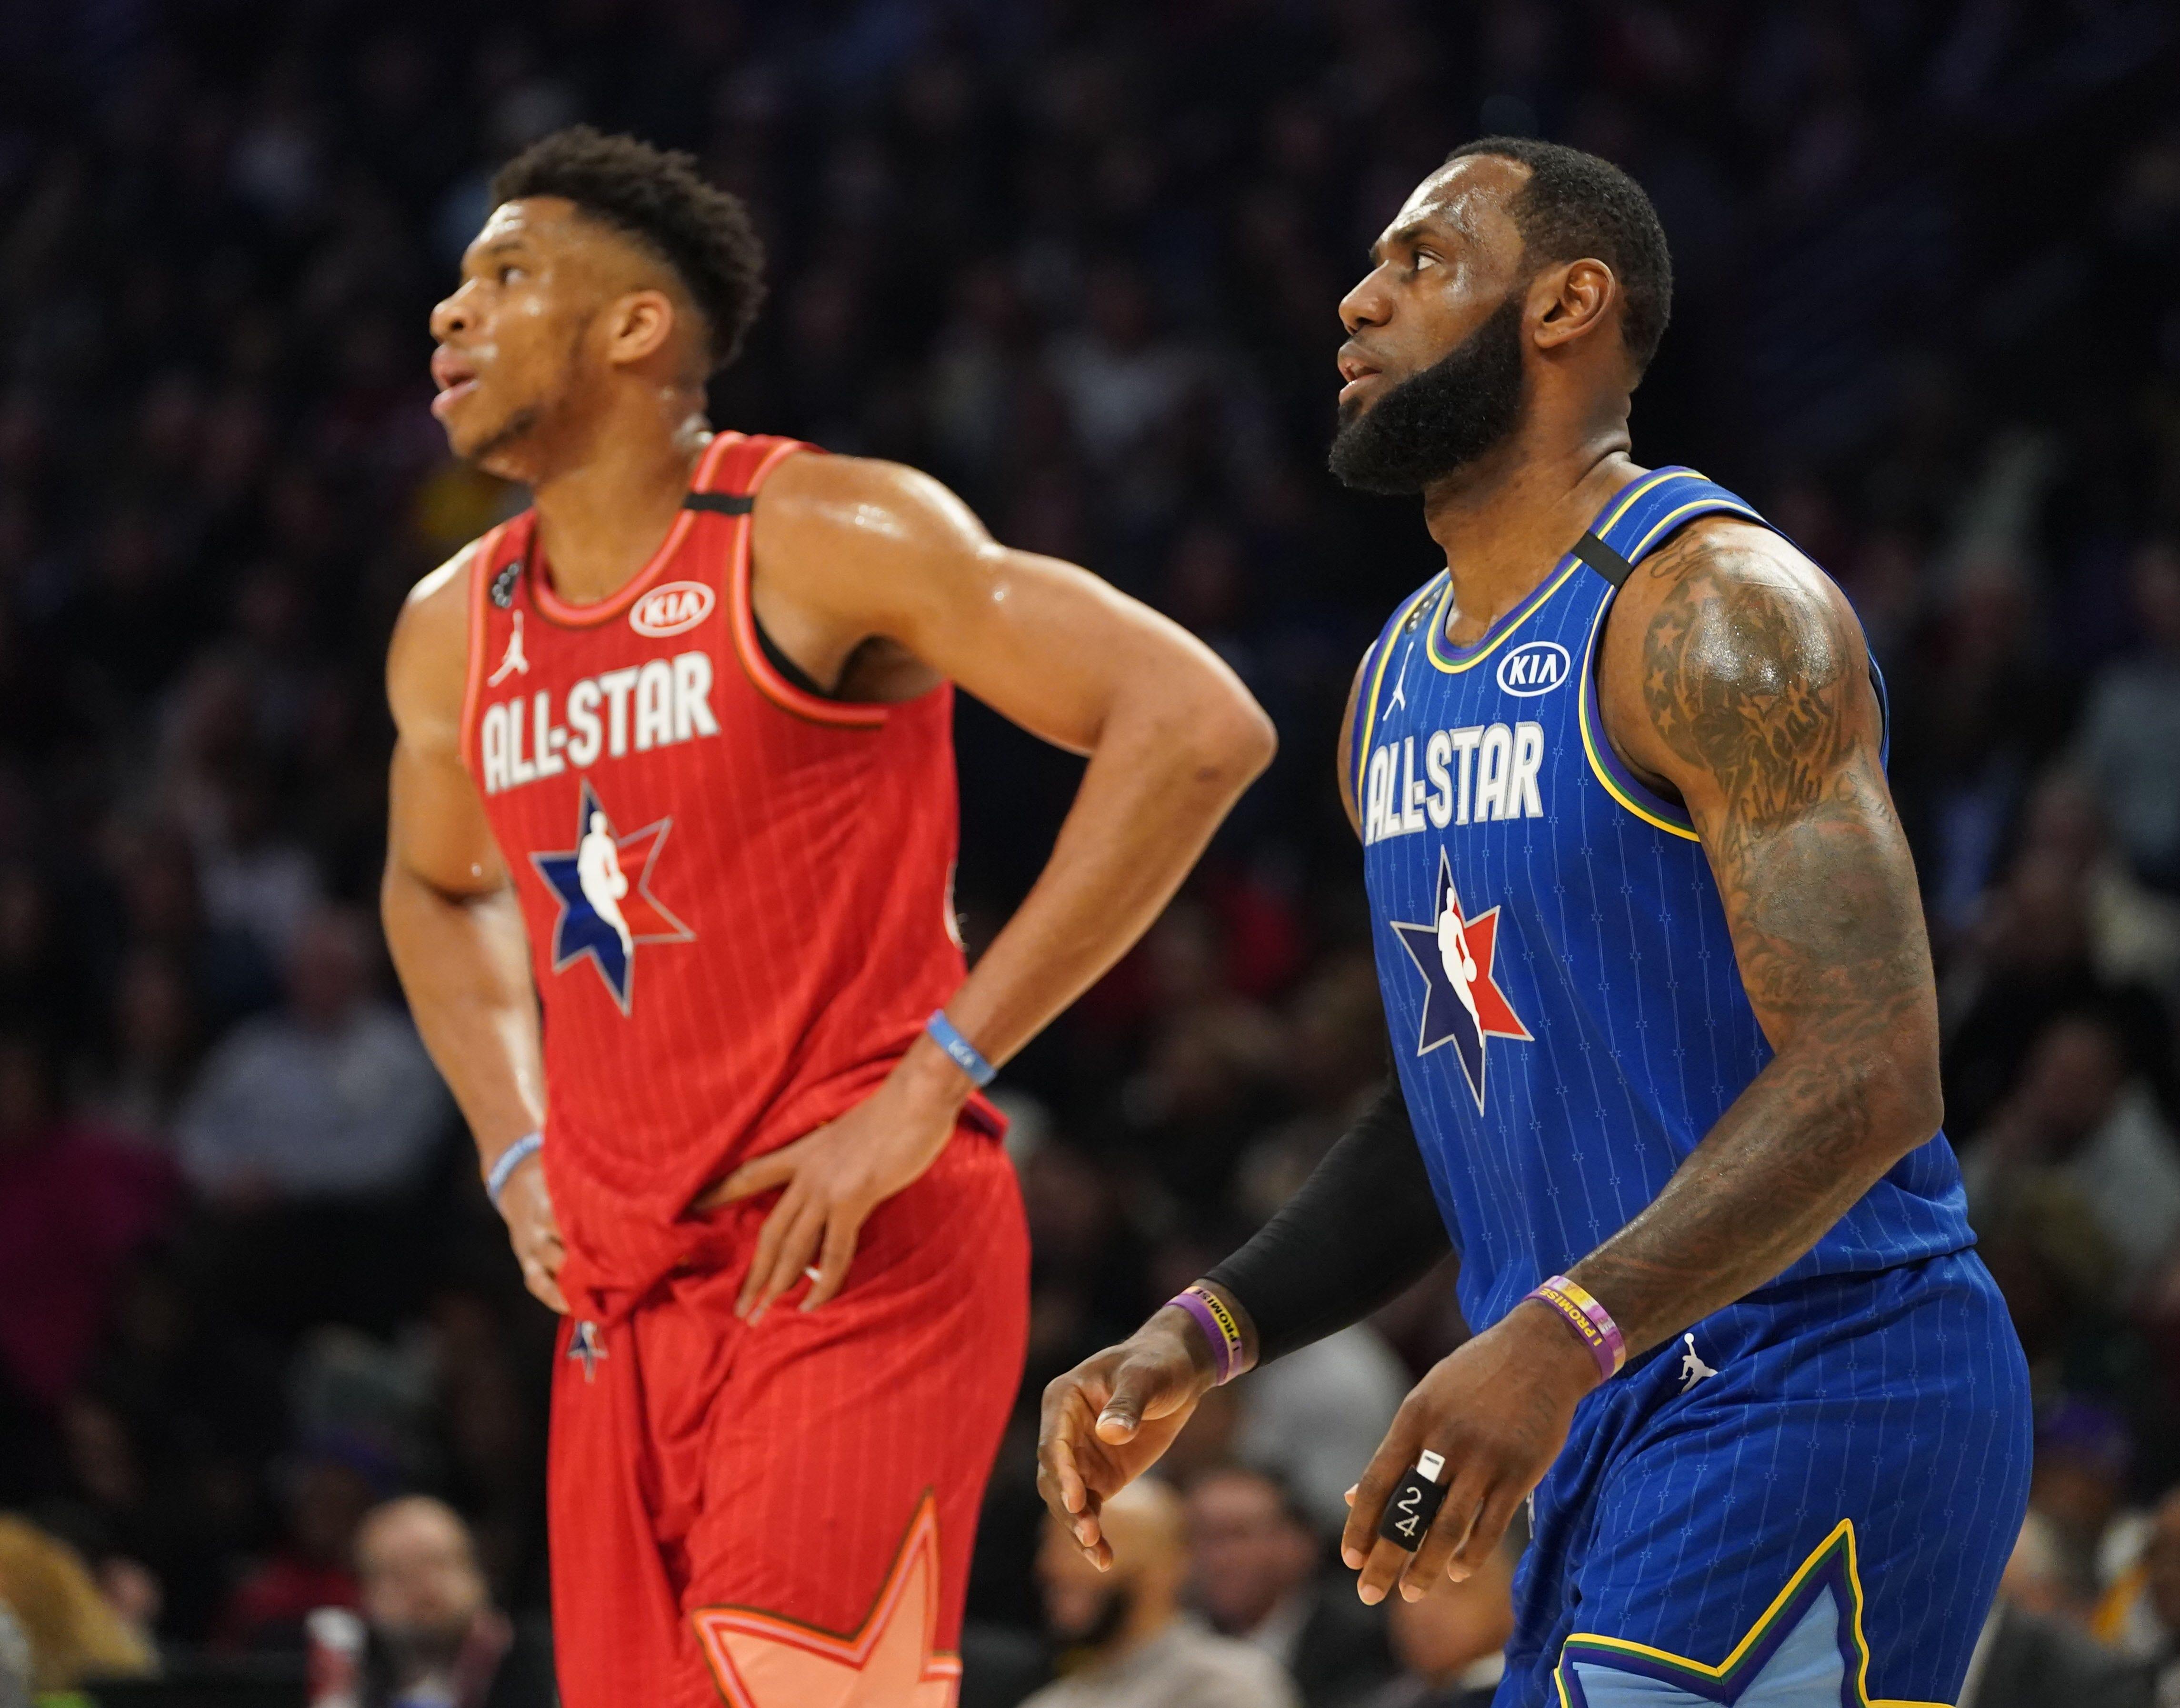 NBA considering potential 2021 All-Star Game in Atlanta